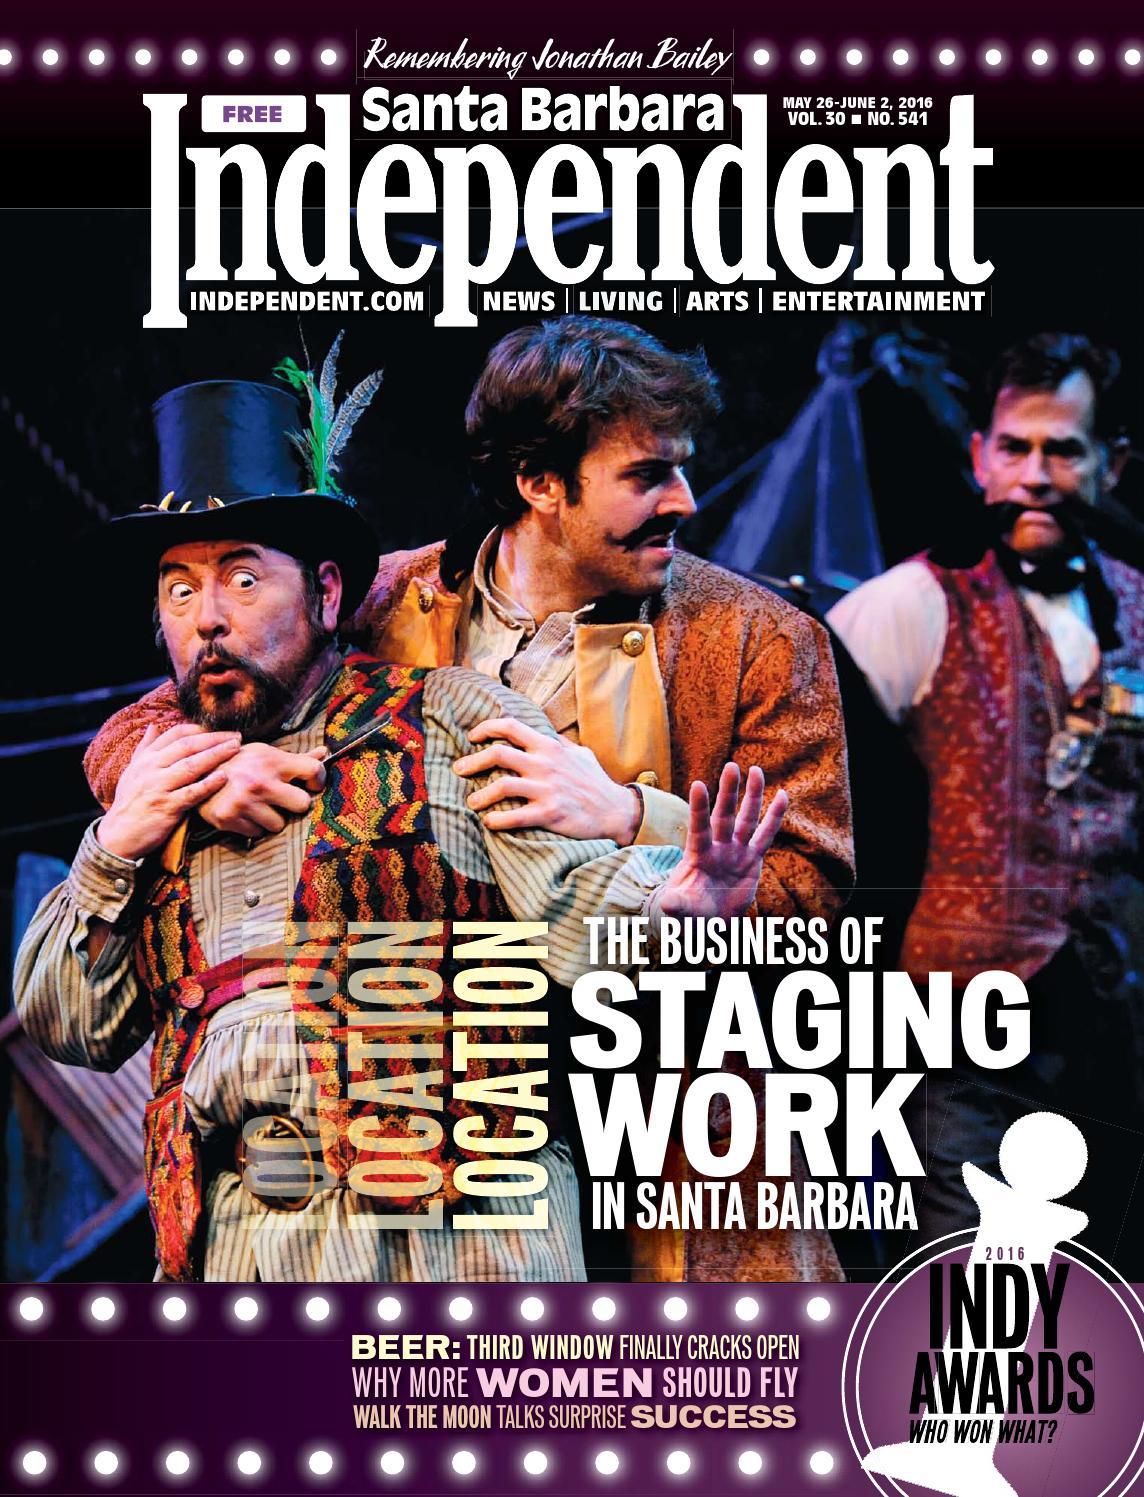 Santa Barbara Independent, 5 26 2016 by SB Independent - issuu 2ed00614cc30